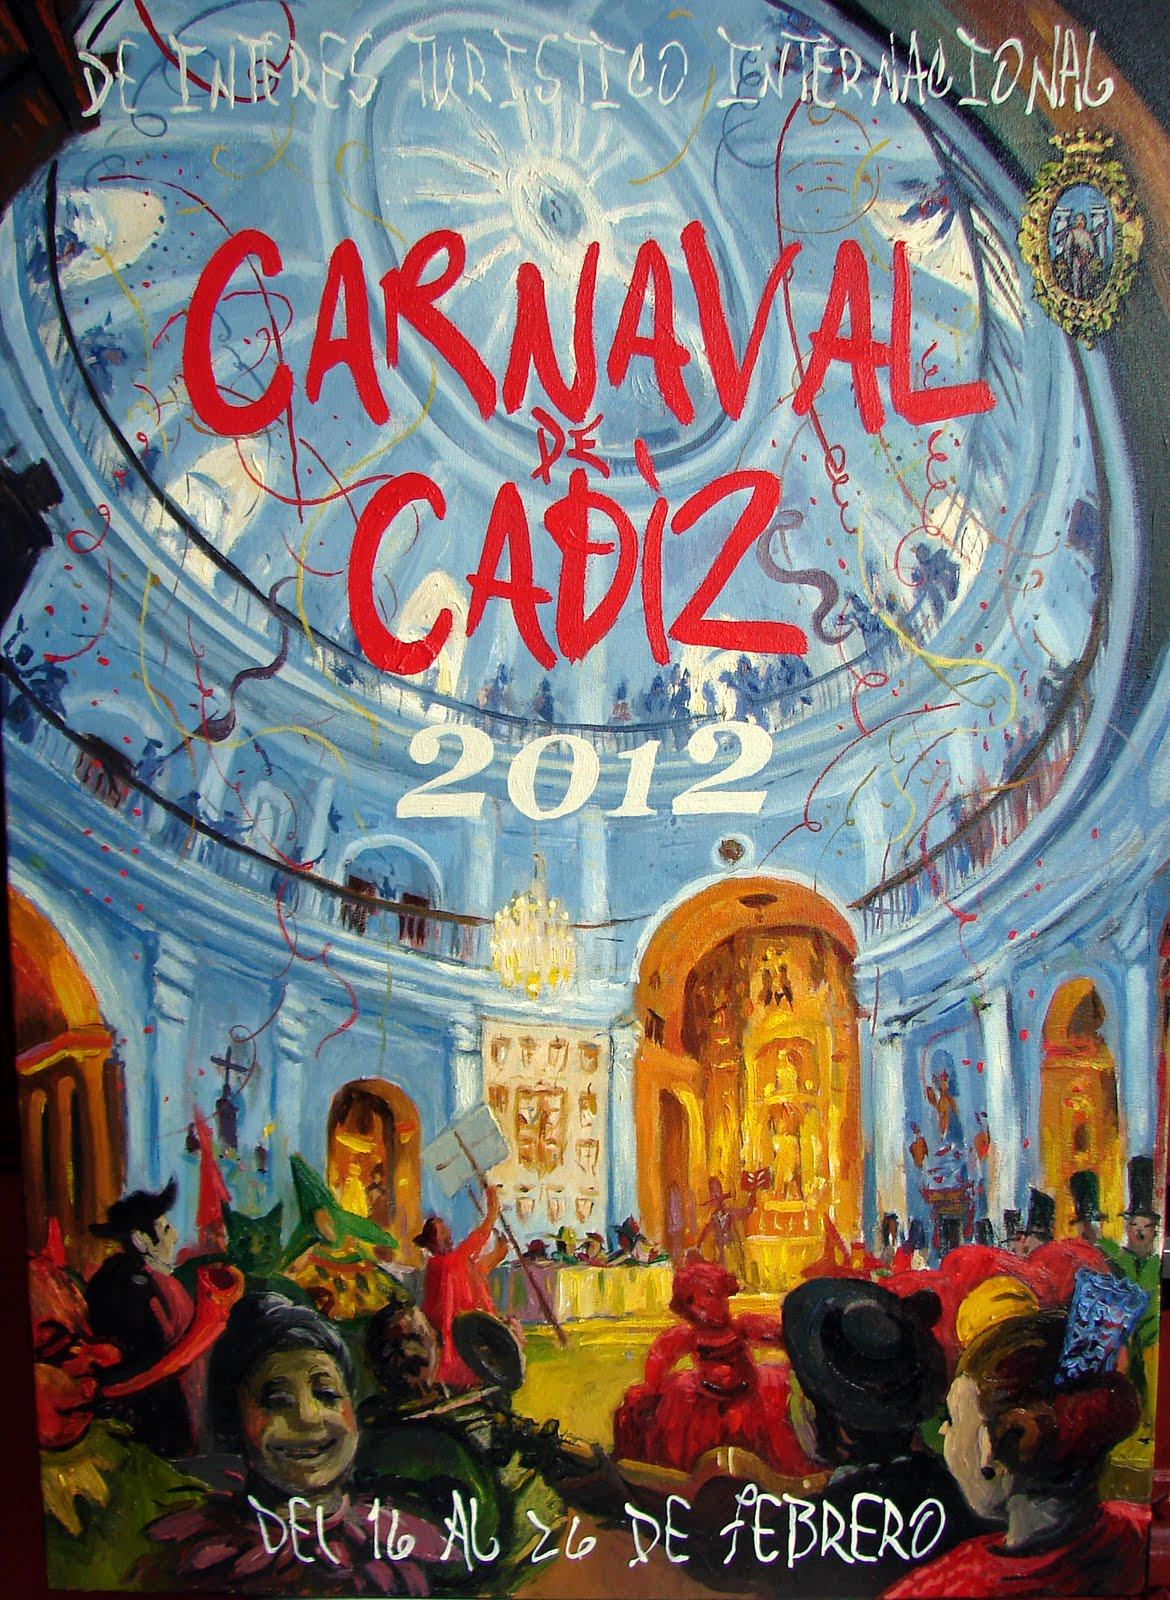 CARTEL DEL CARNAVAL DE CÁDIZ 2012